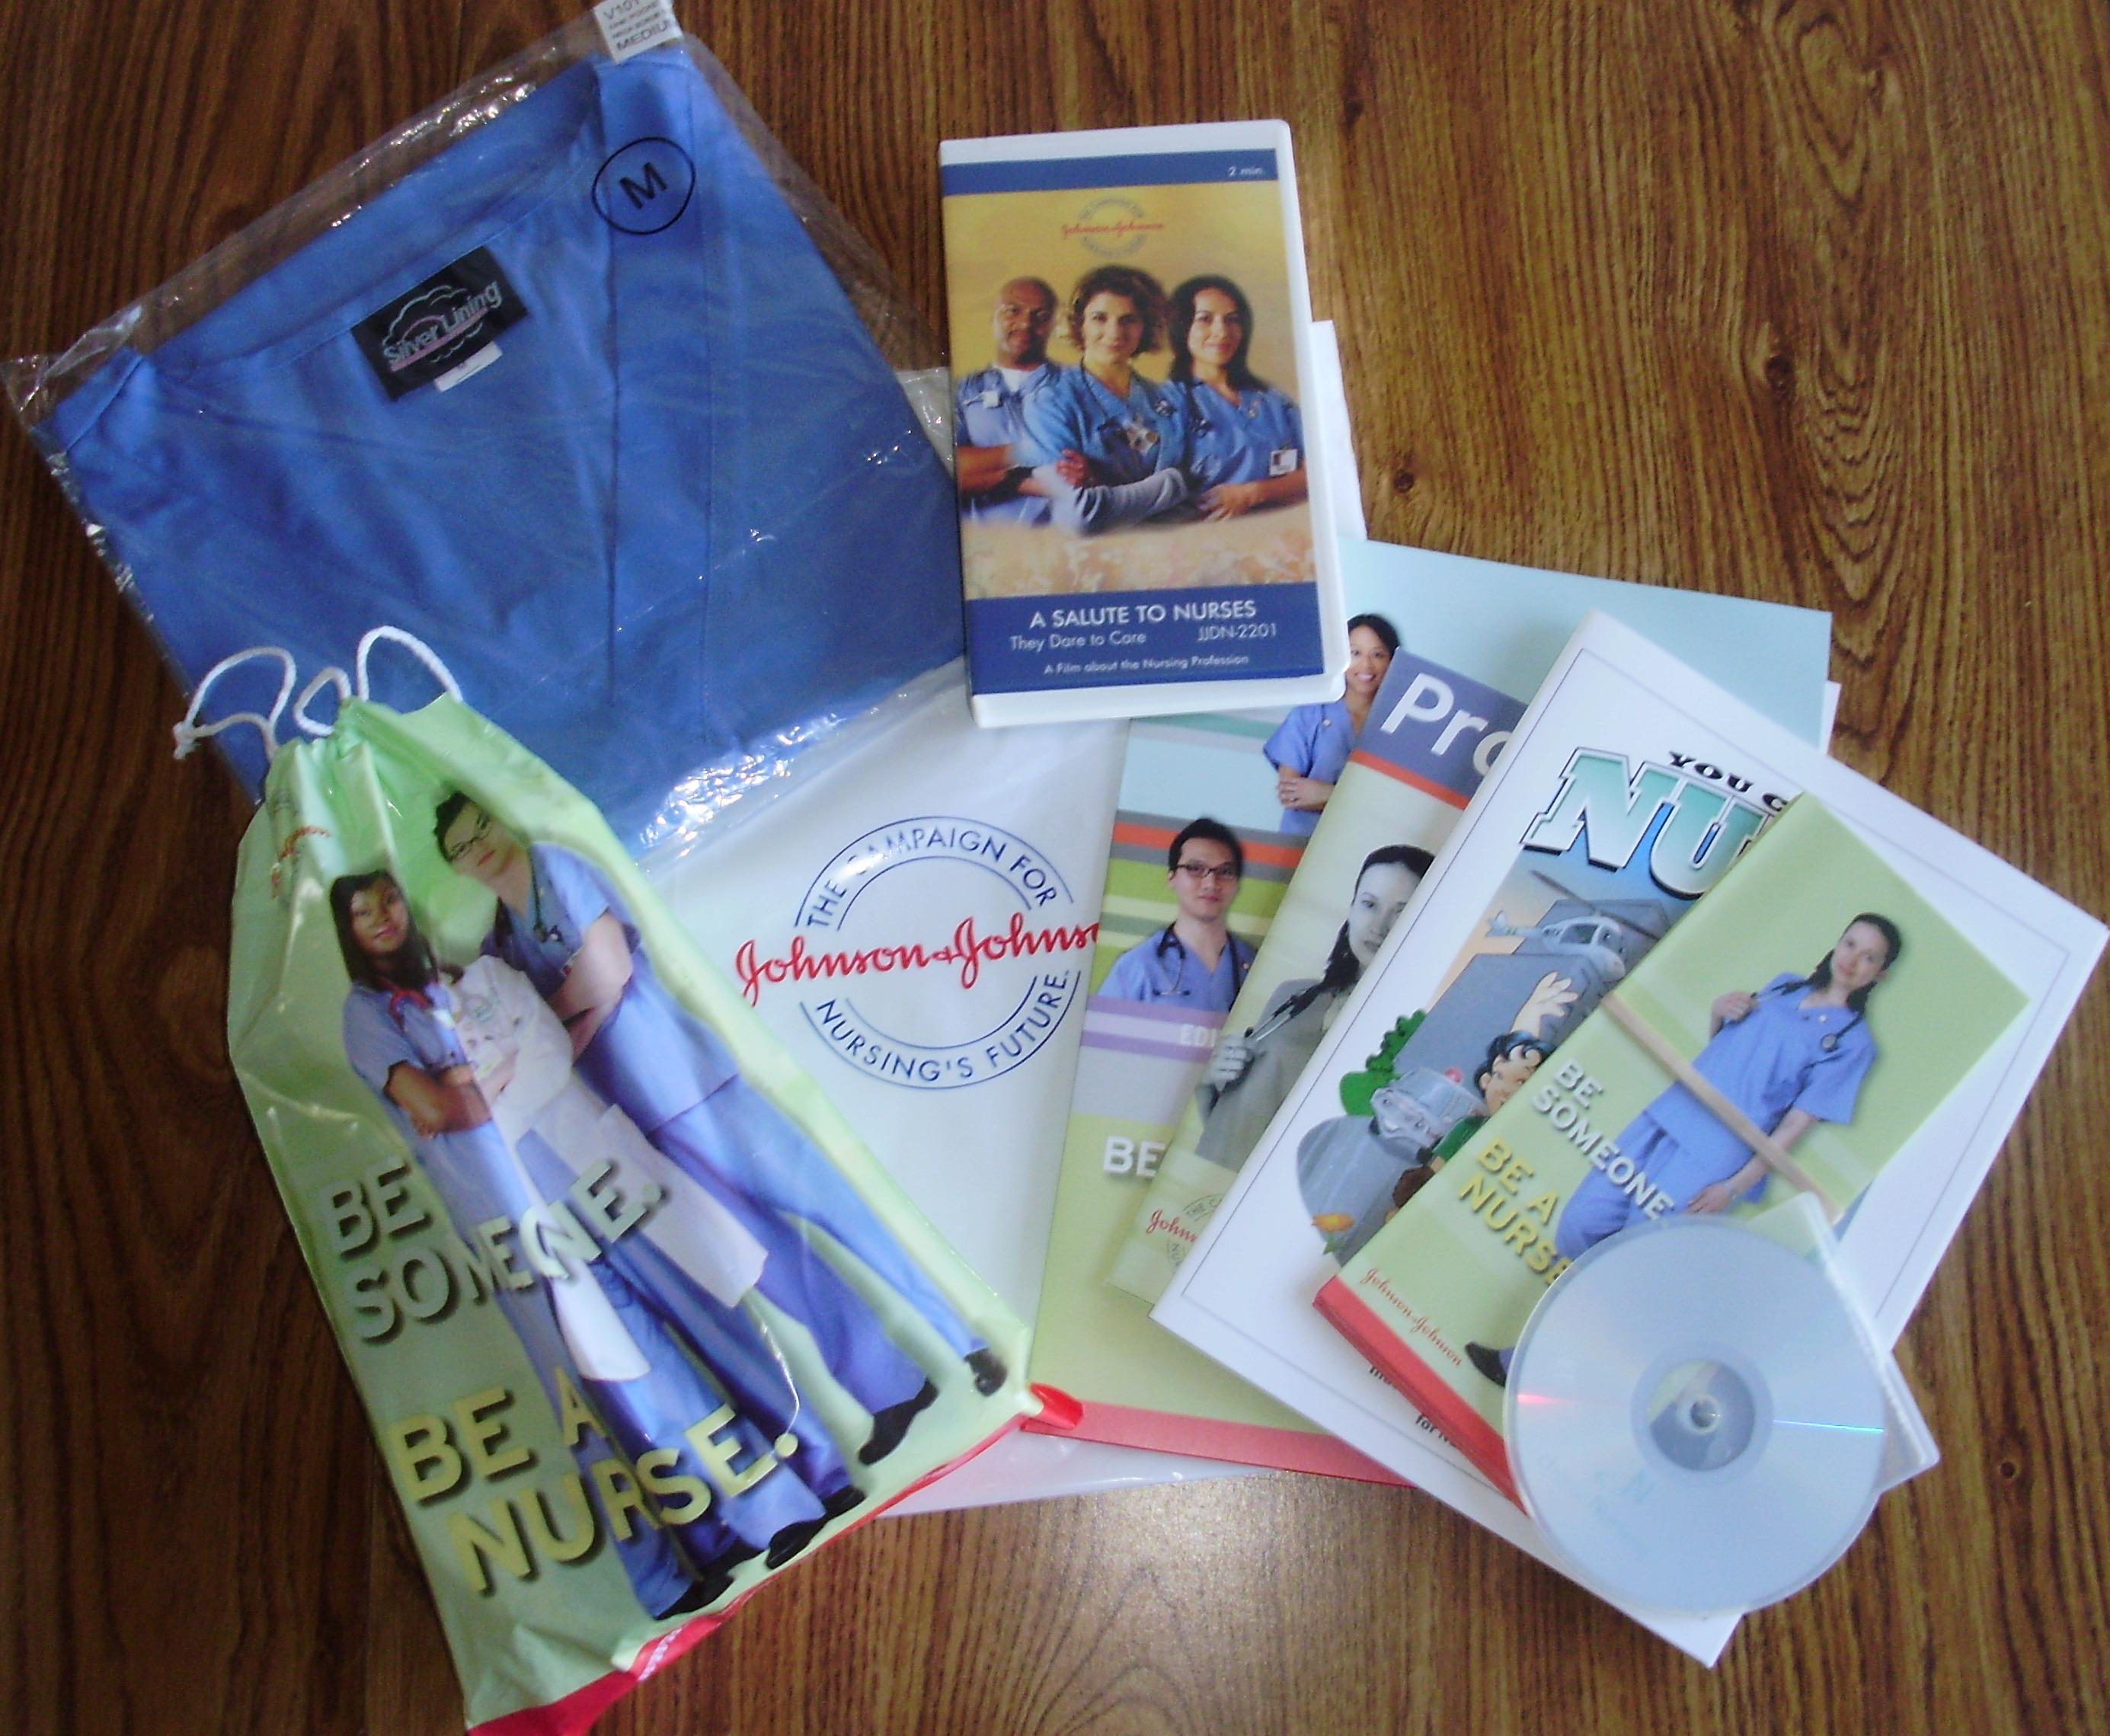 Johnson Amp Johnson Nurses Kit